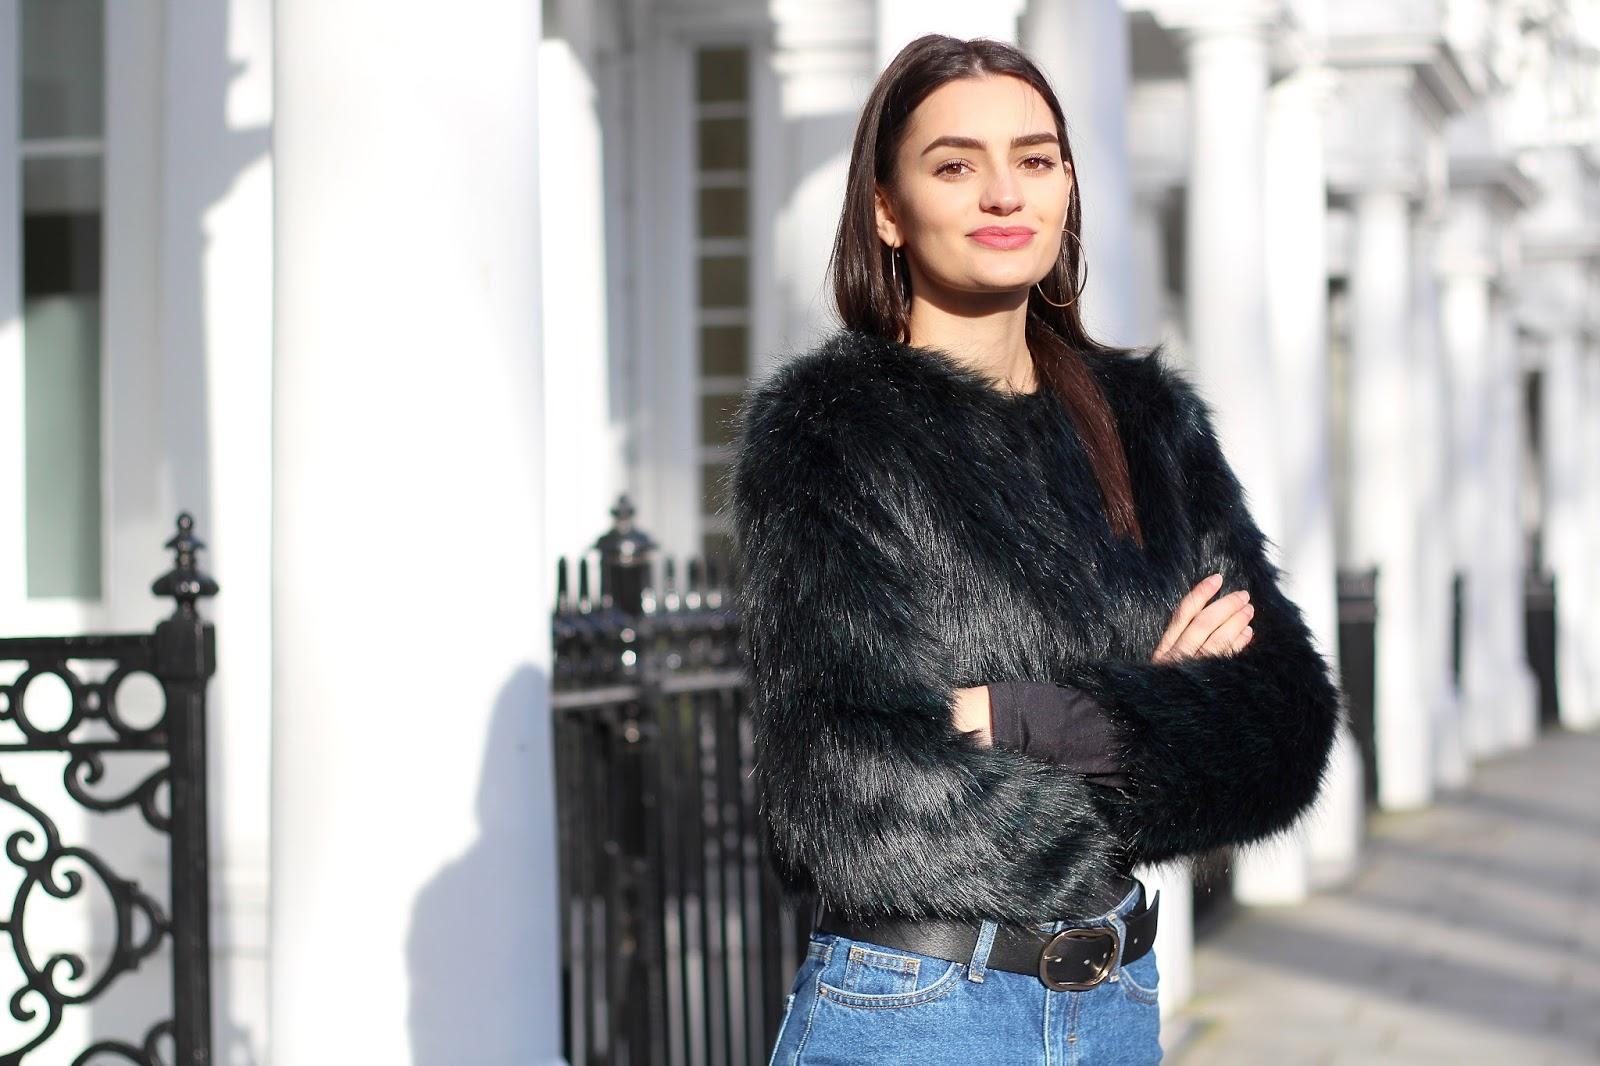 london fashion blog peexo personal style